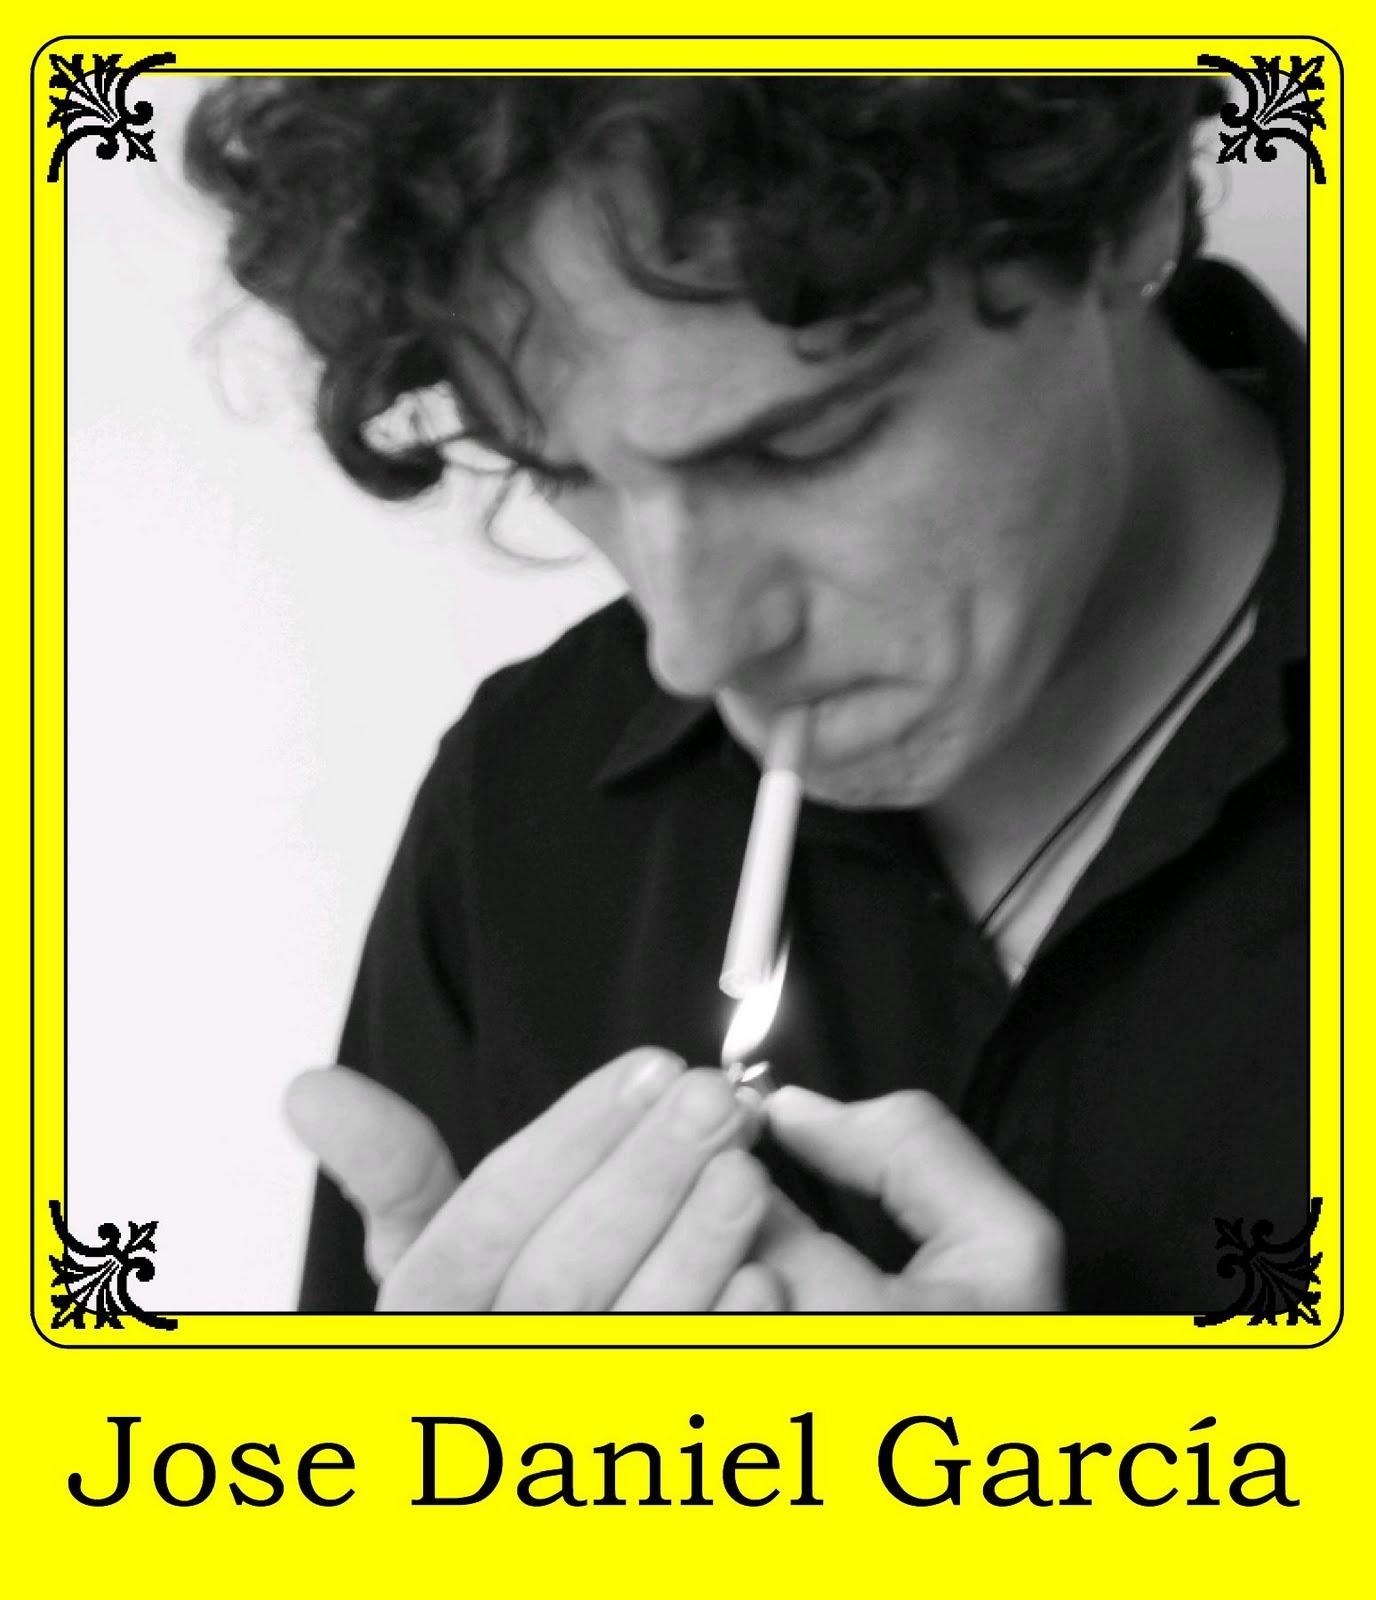 Image Jose Daniel Garcia Download 1376x1600